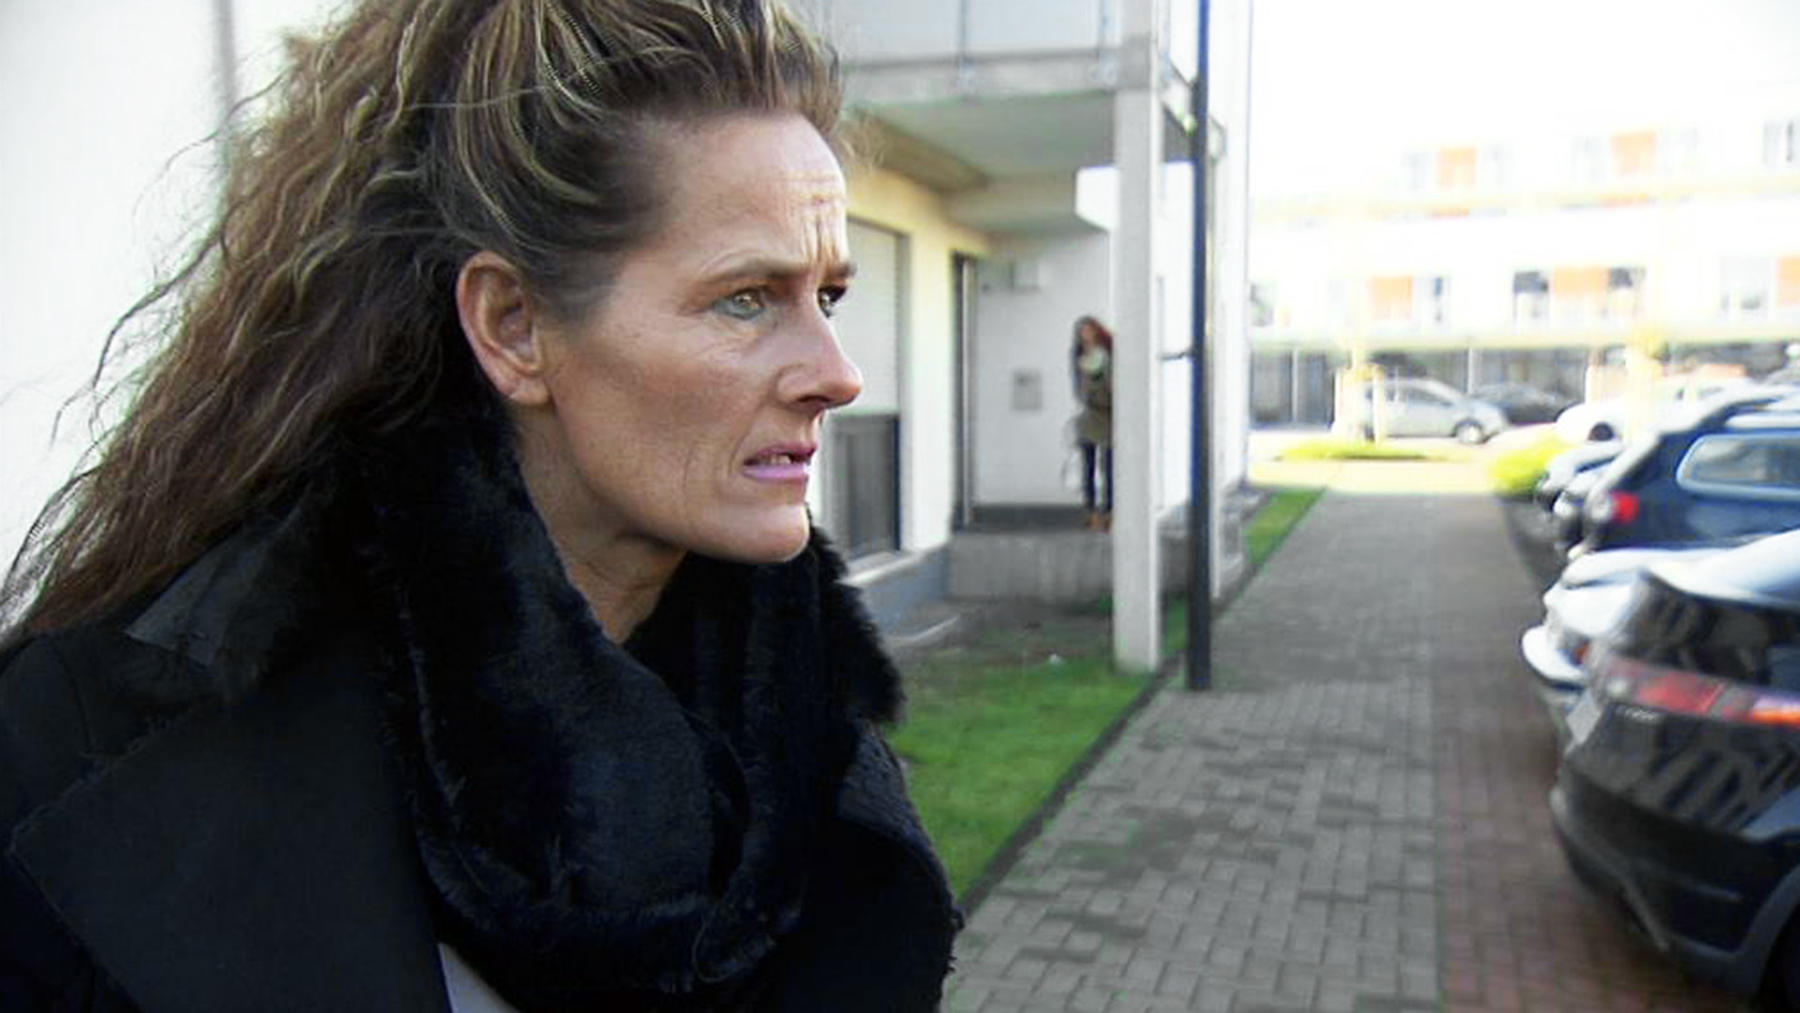 Urlaubsreife Mutter legt Schuldirektor megadreist rein | Folge 112